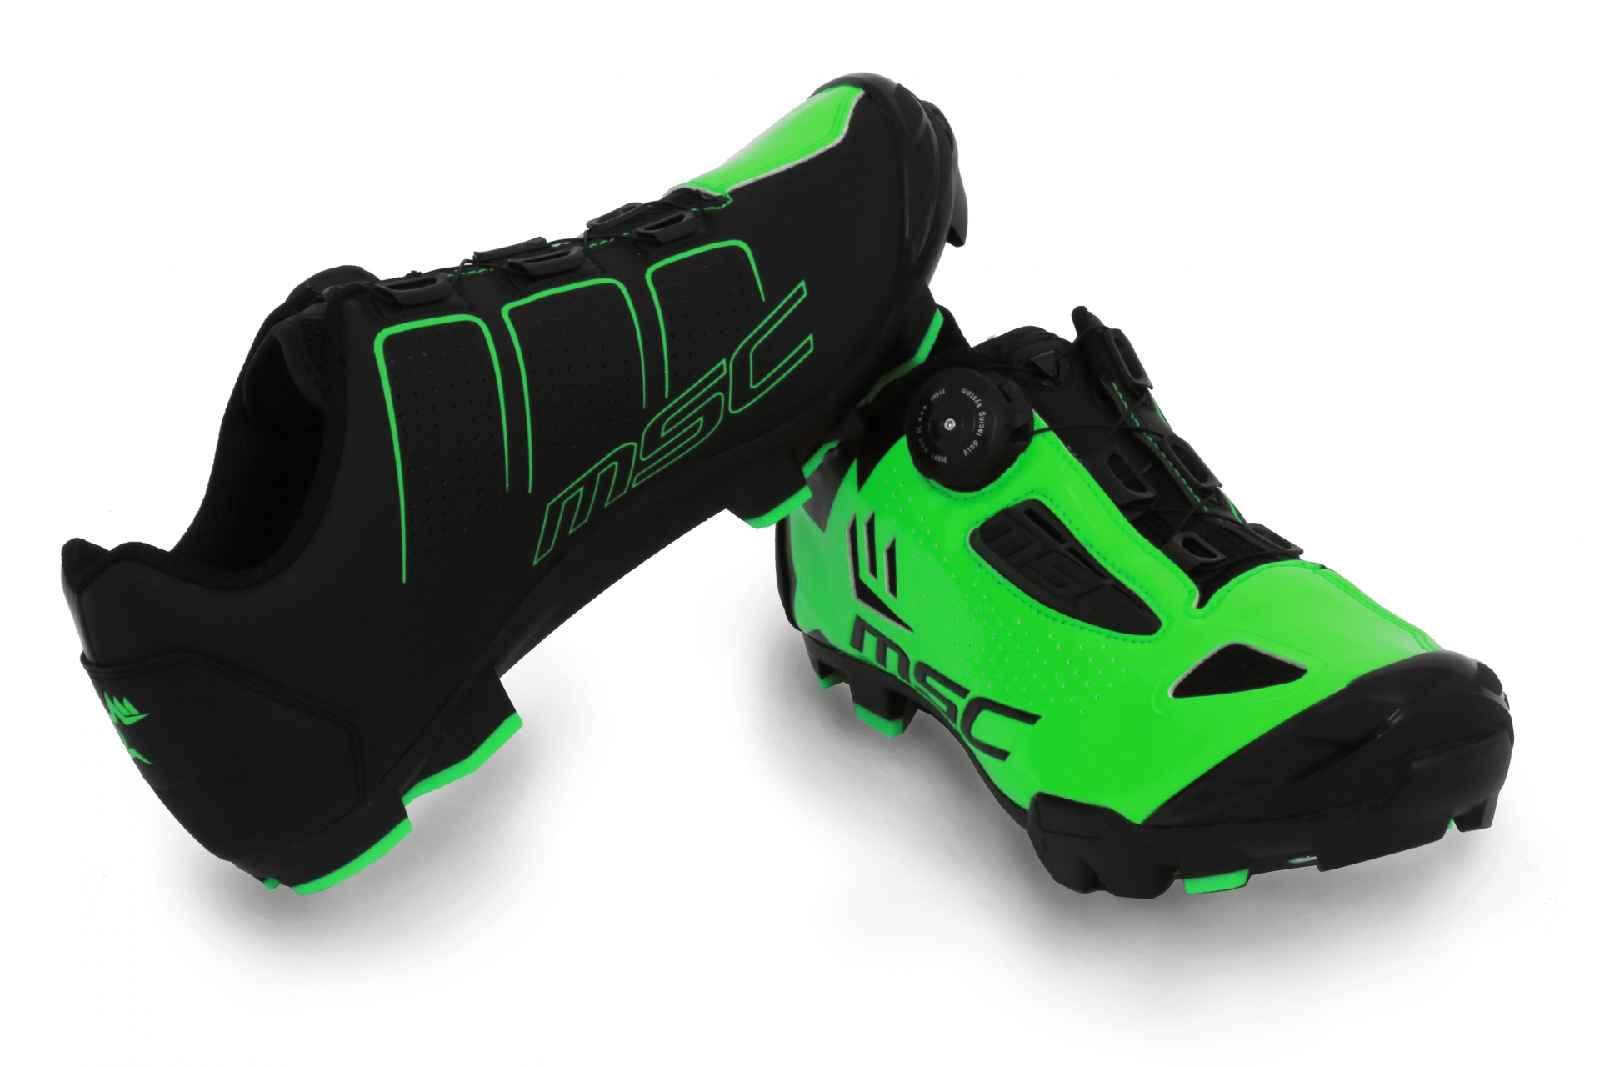 MSC Bikes Aero Road Chaussures Cyclisme, Vert, t-42